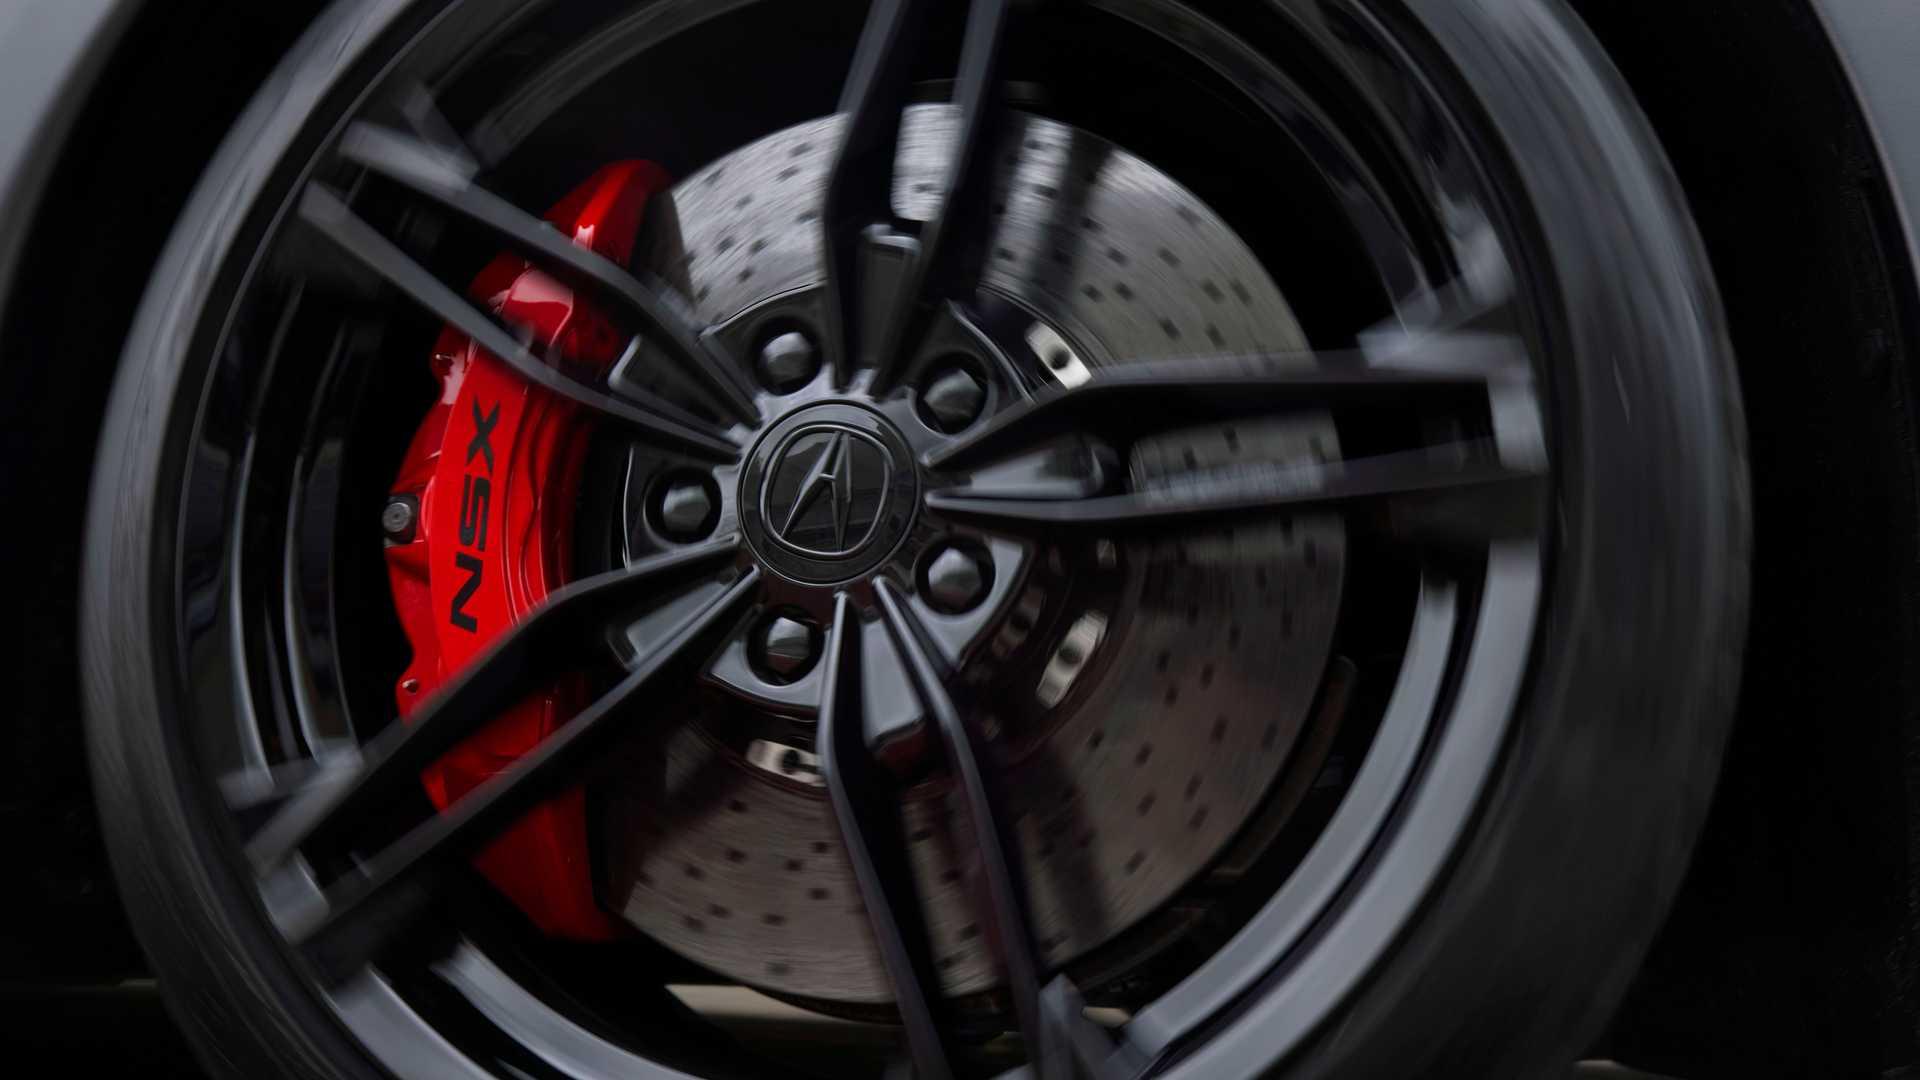 2022-acura-nsx-type-s-wheel.jpg